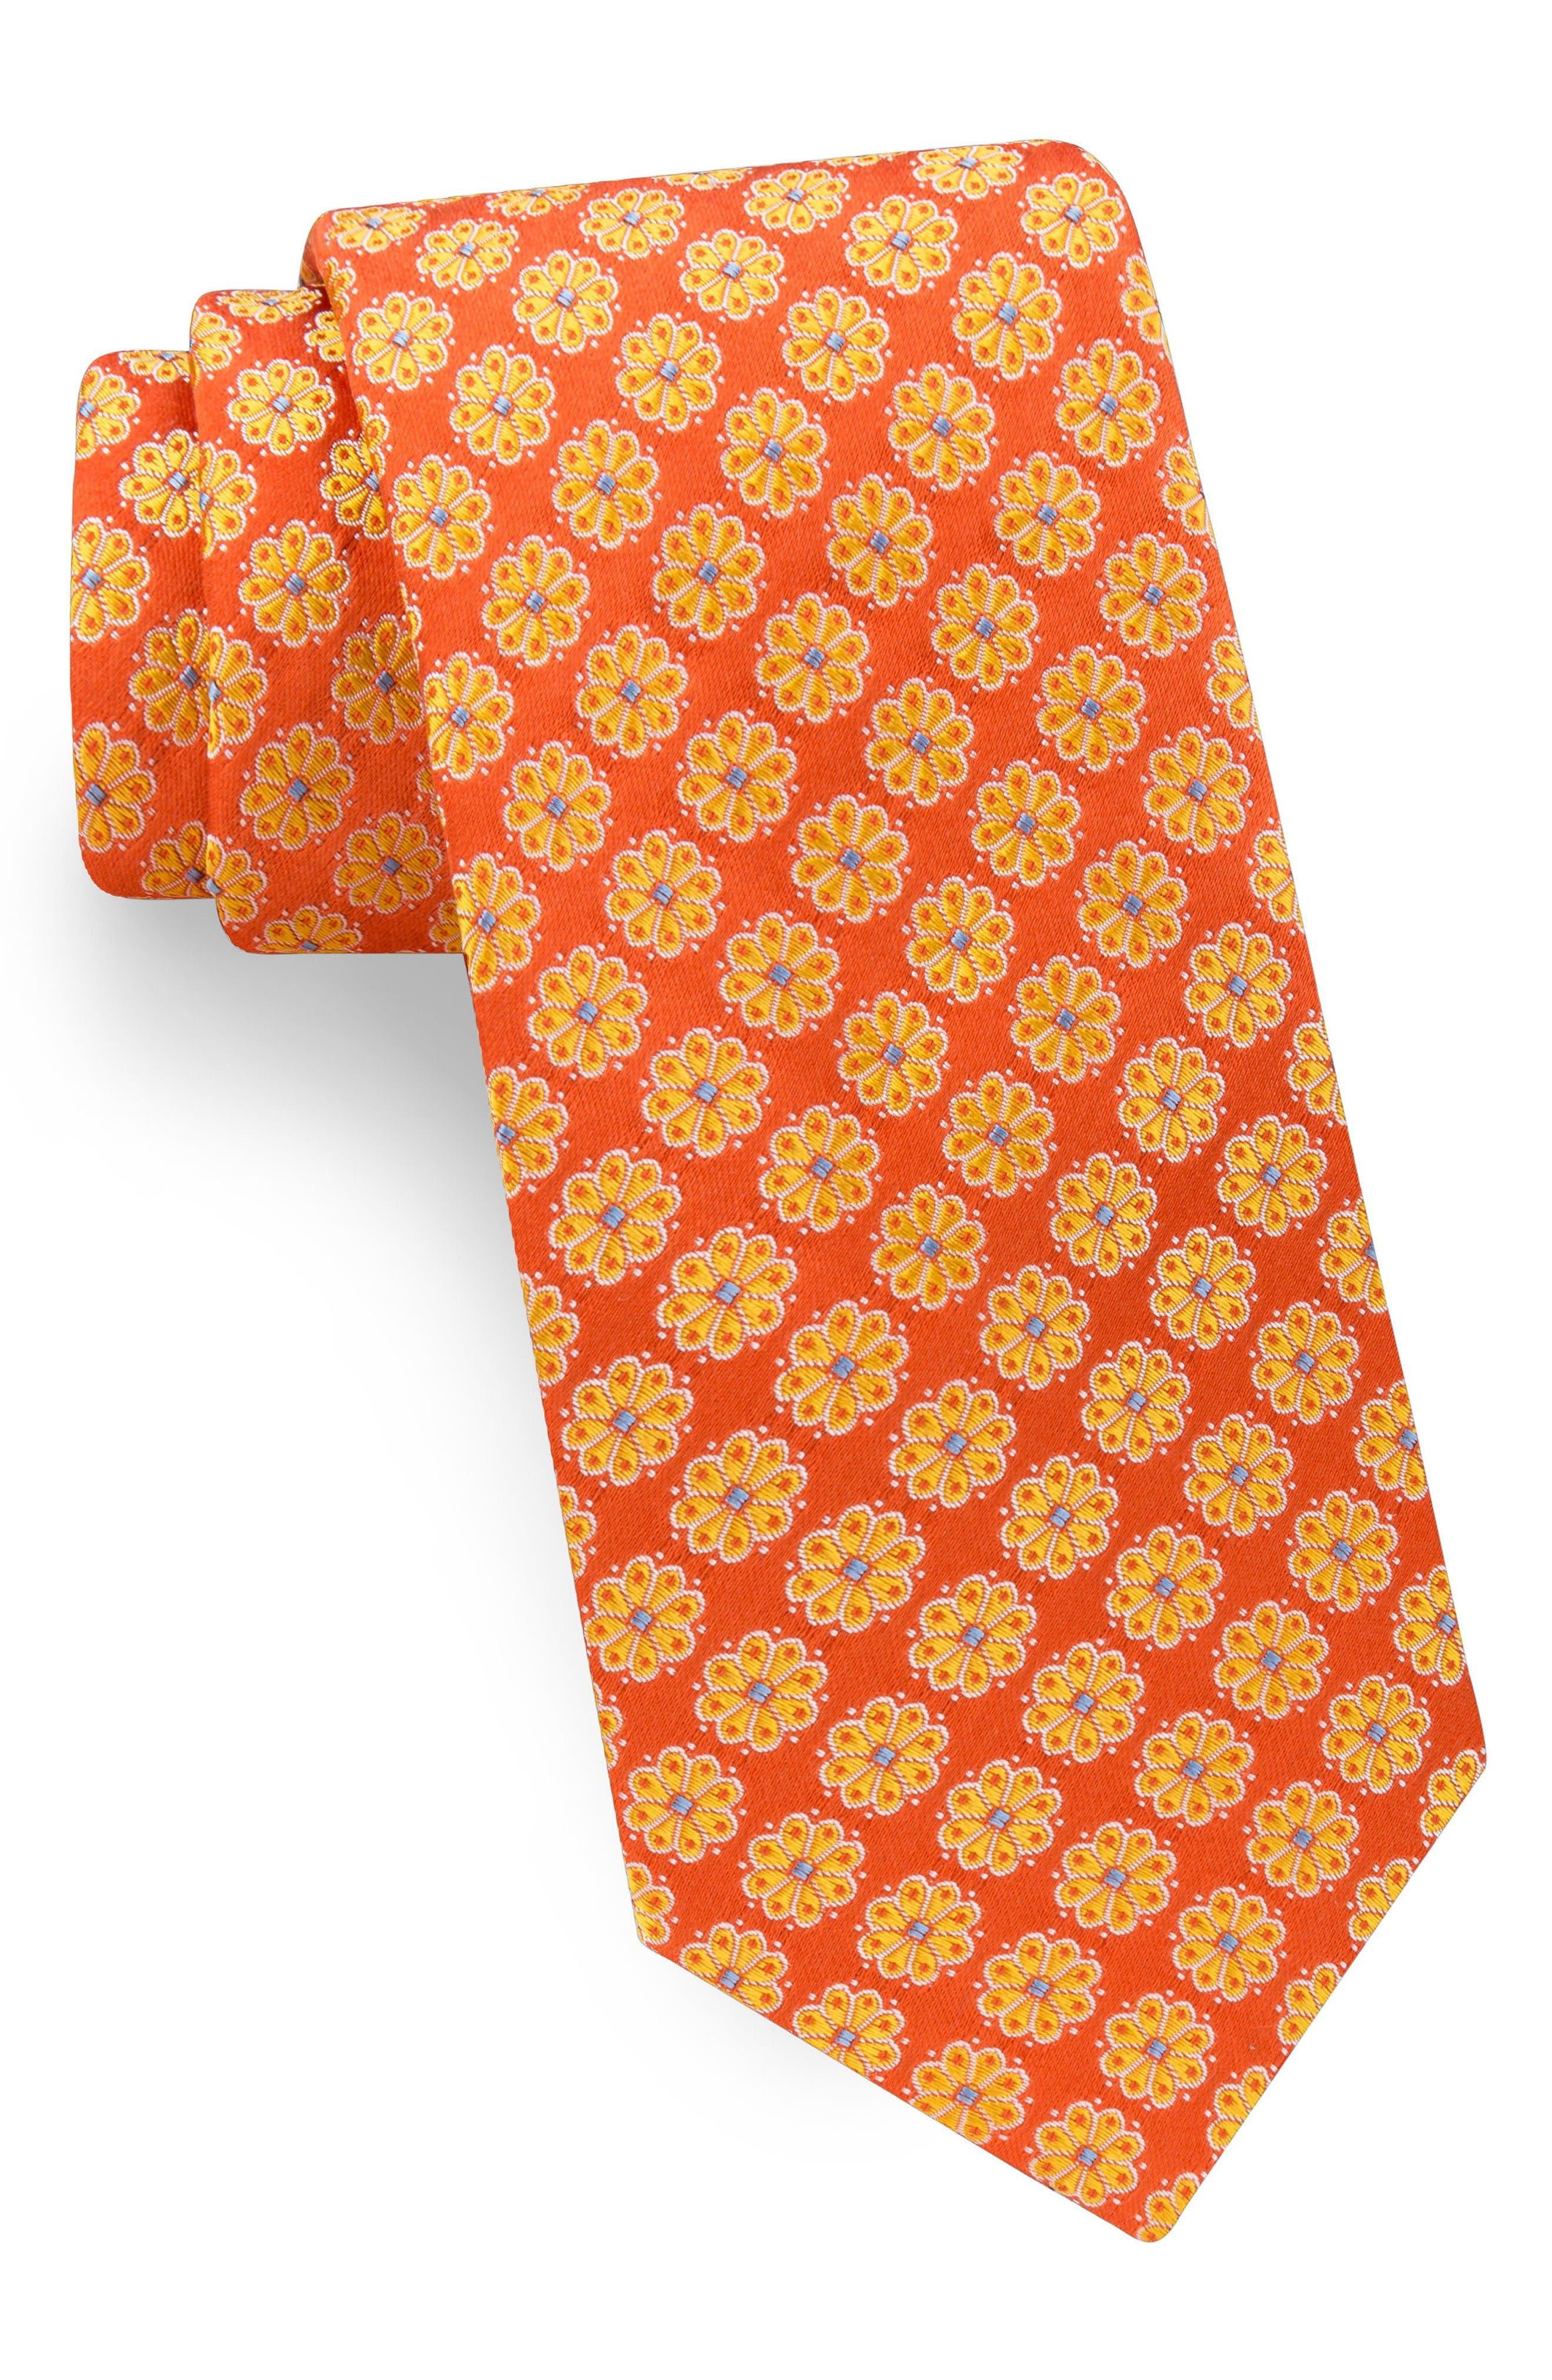 Alternate Image 1 Selected - Ted Baker London Daisy Silk Tie